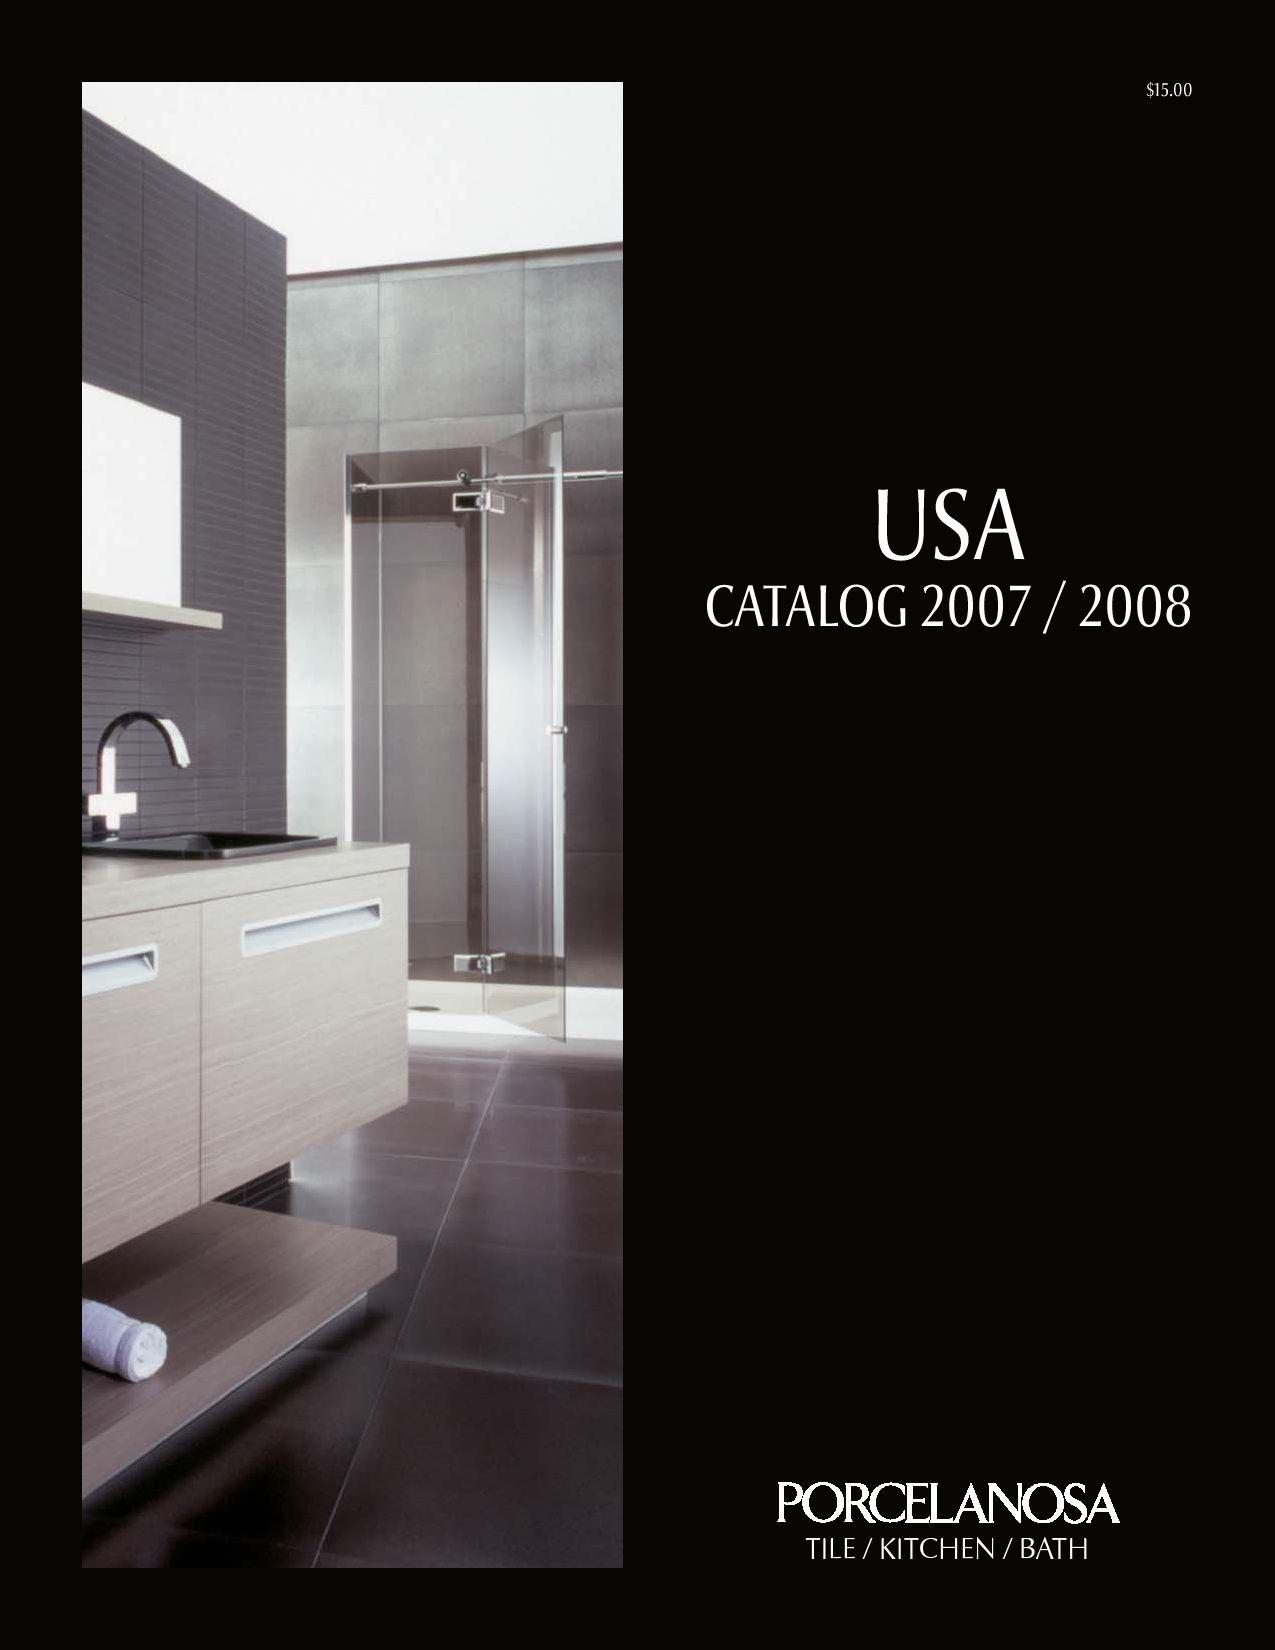 porcelanosa usa catalog 2007 08 by porcelanosa issuu. Black Bedroom Furniture Sets. Home Design Ideas